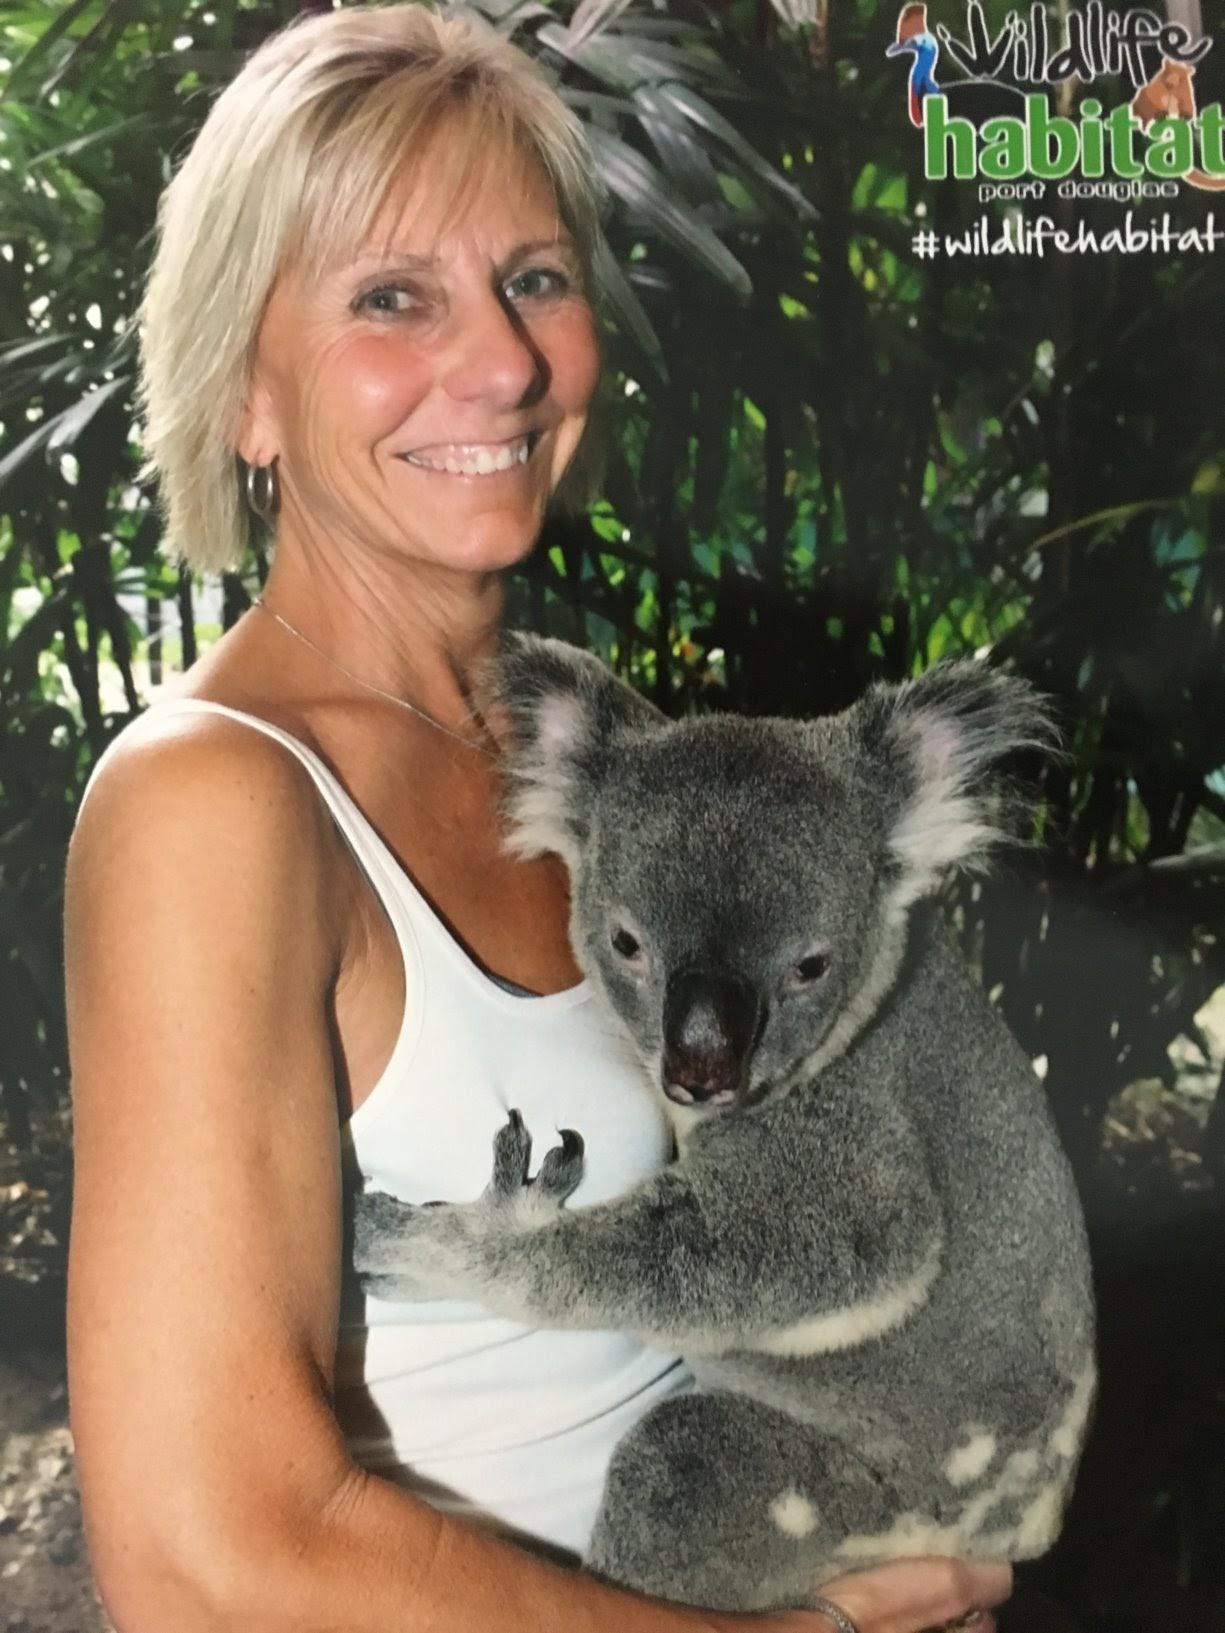 Wildlife Habitat - Port Douglas